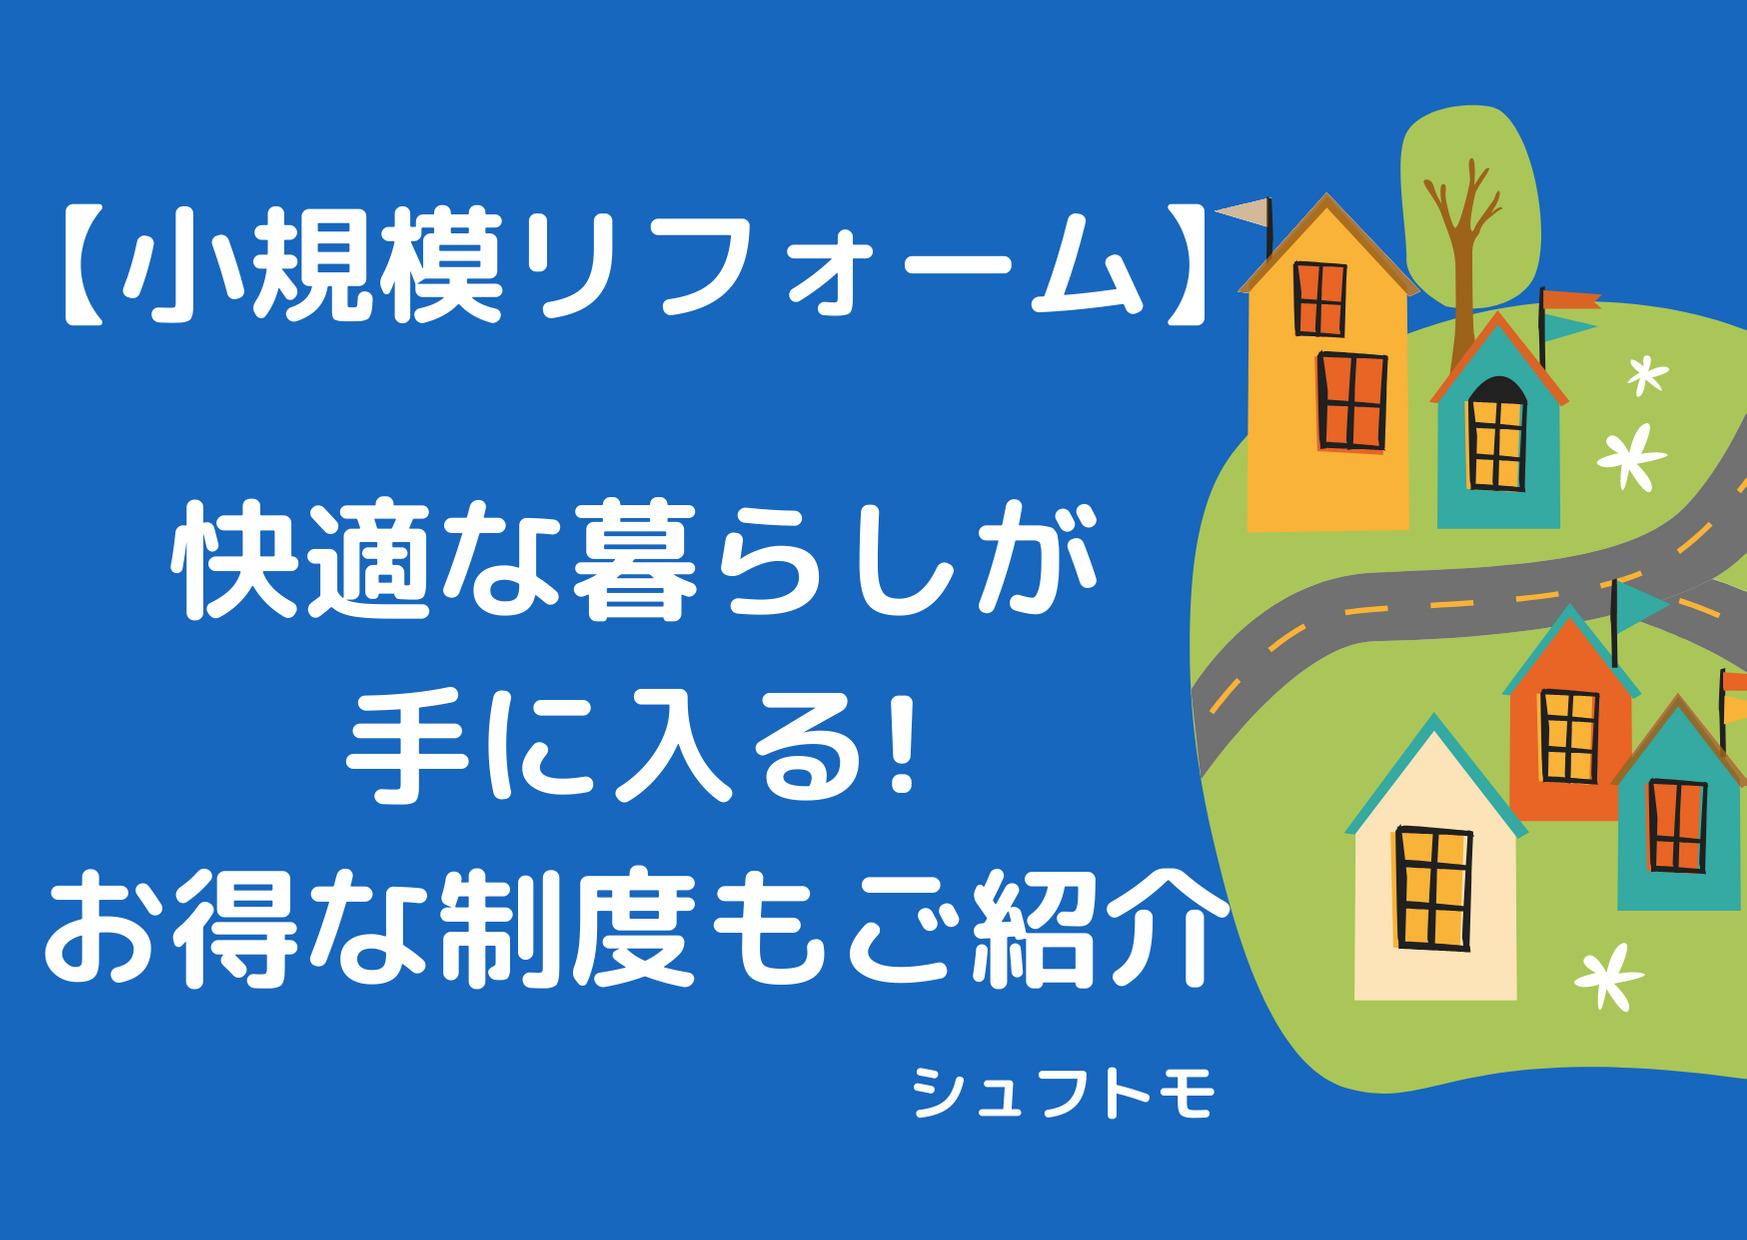 syou-kibo-reform